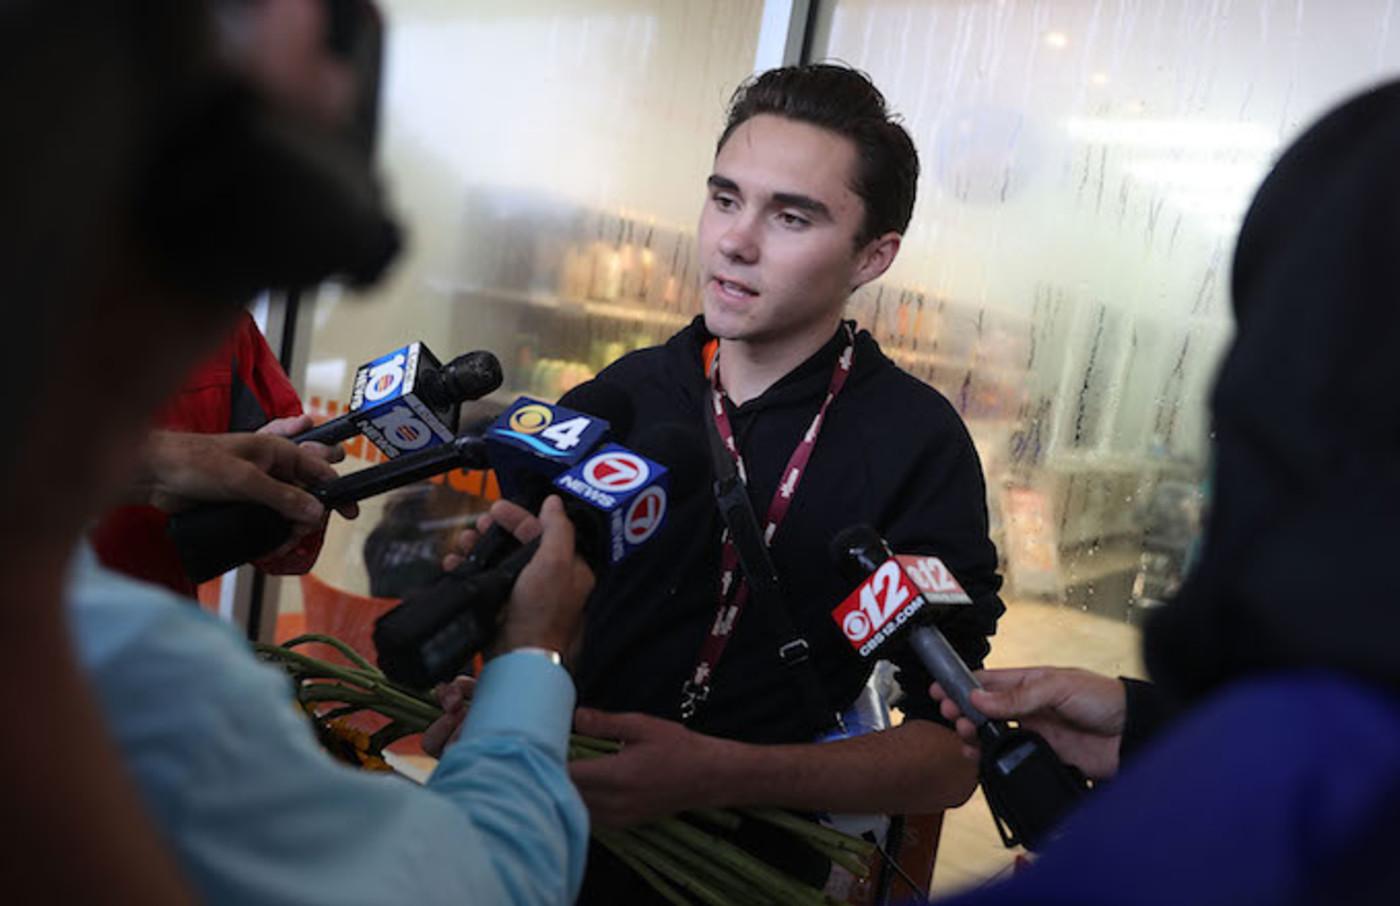 David Hogg, a survivor of the Marjory Stoneman Douglas High School mass shooting.